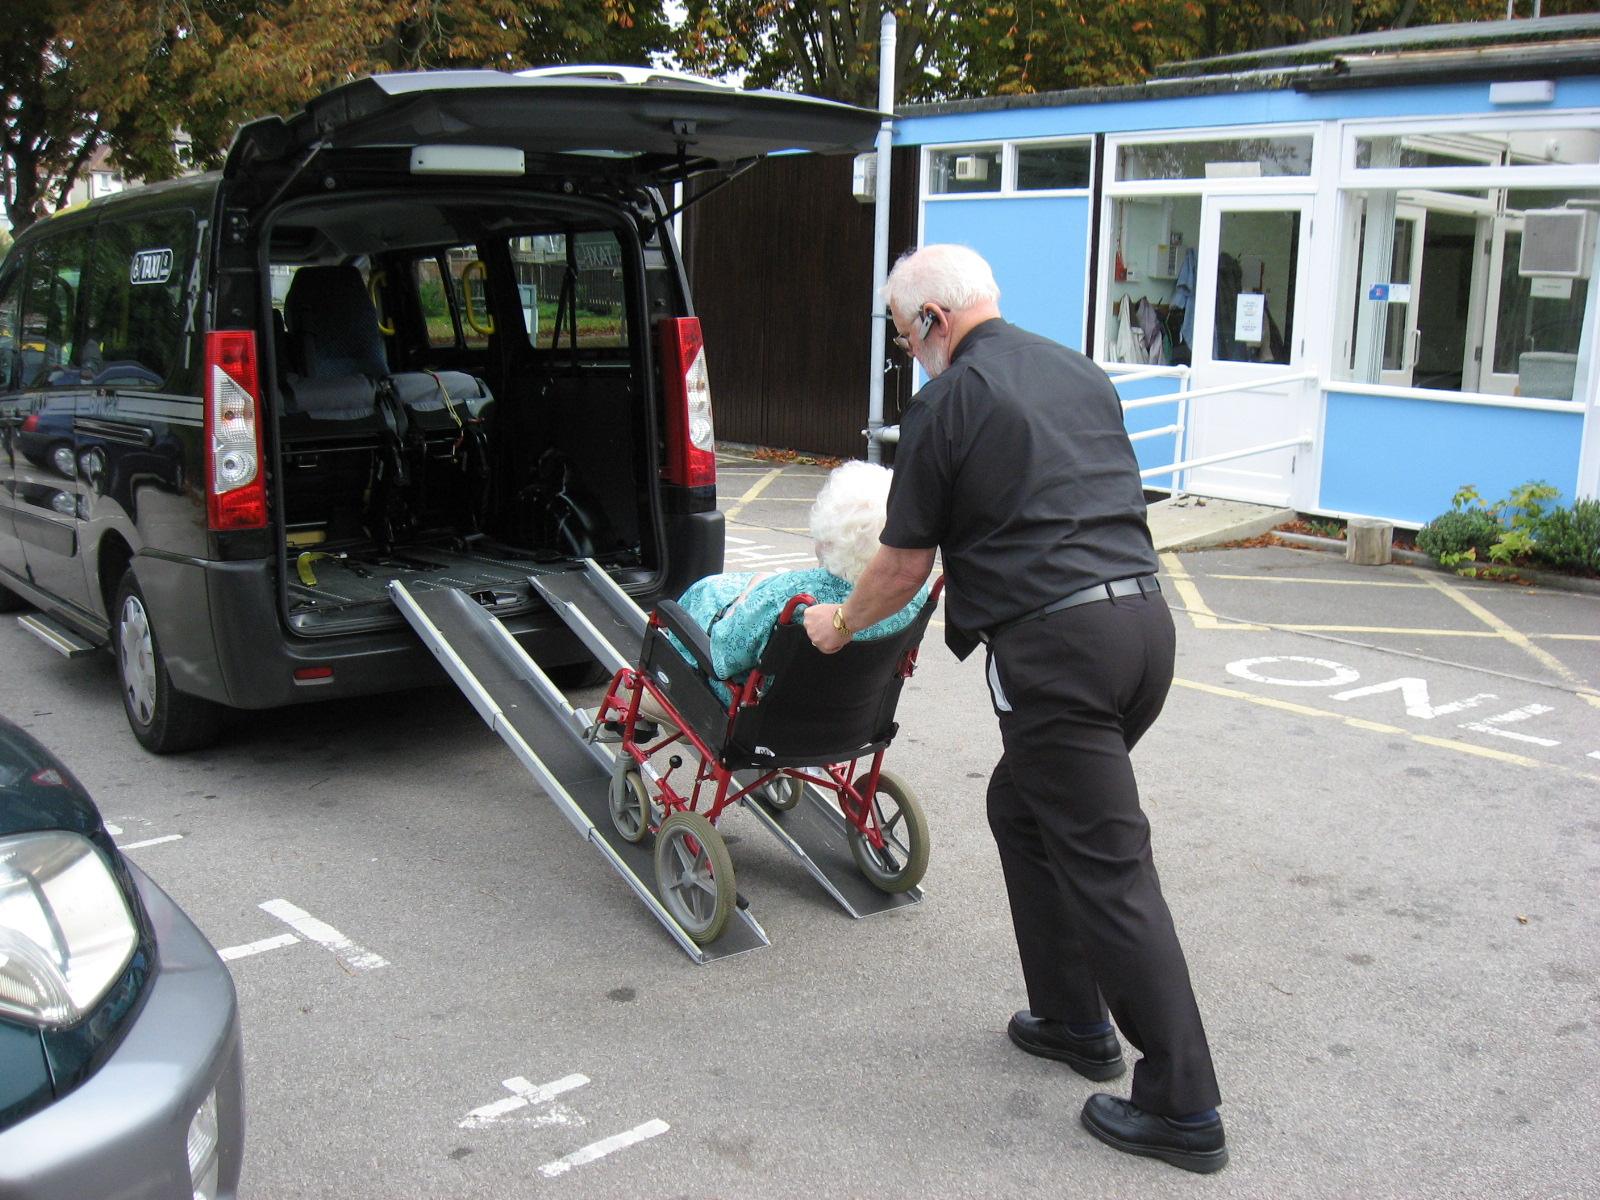 cig bins and wheelchair pics 023